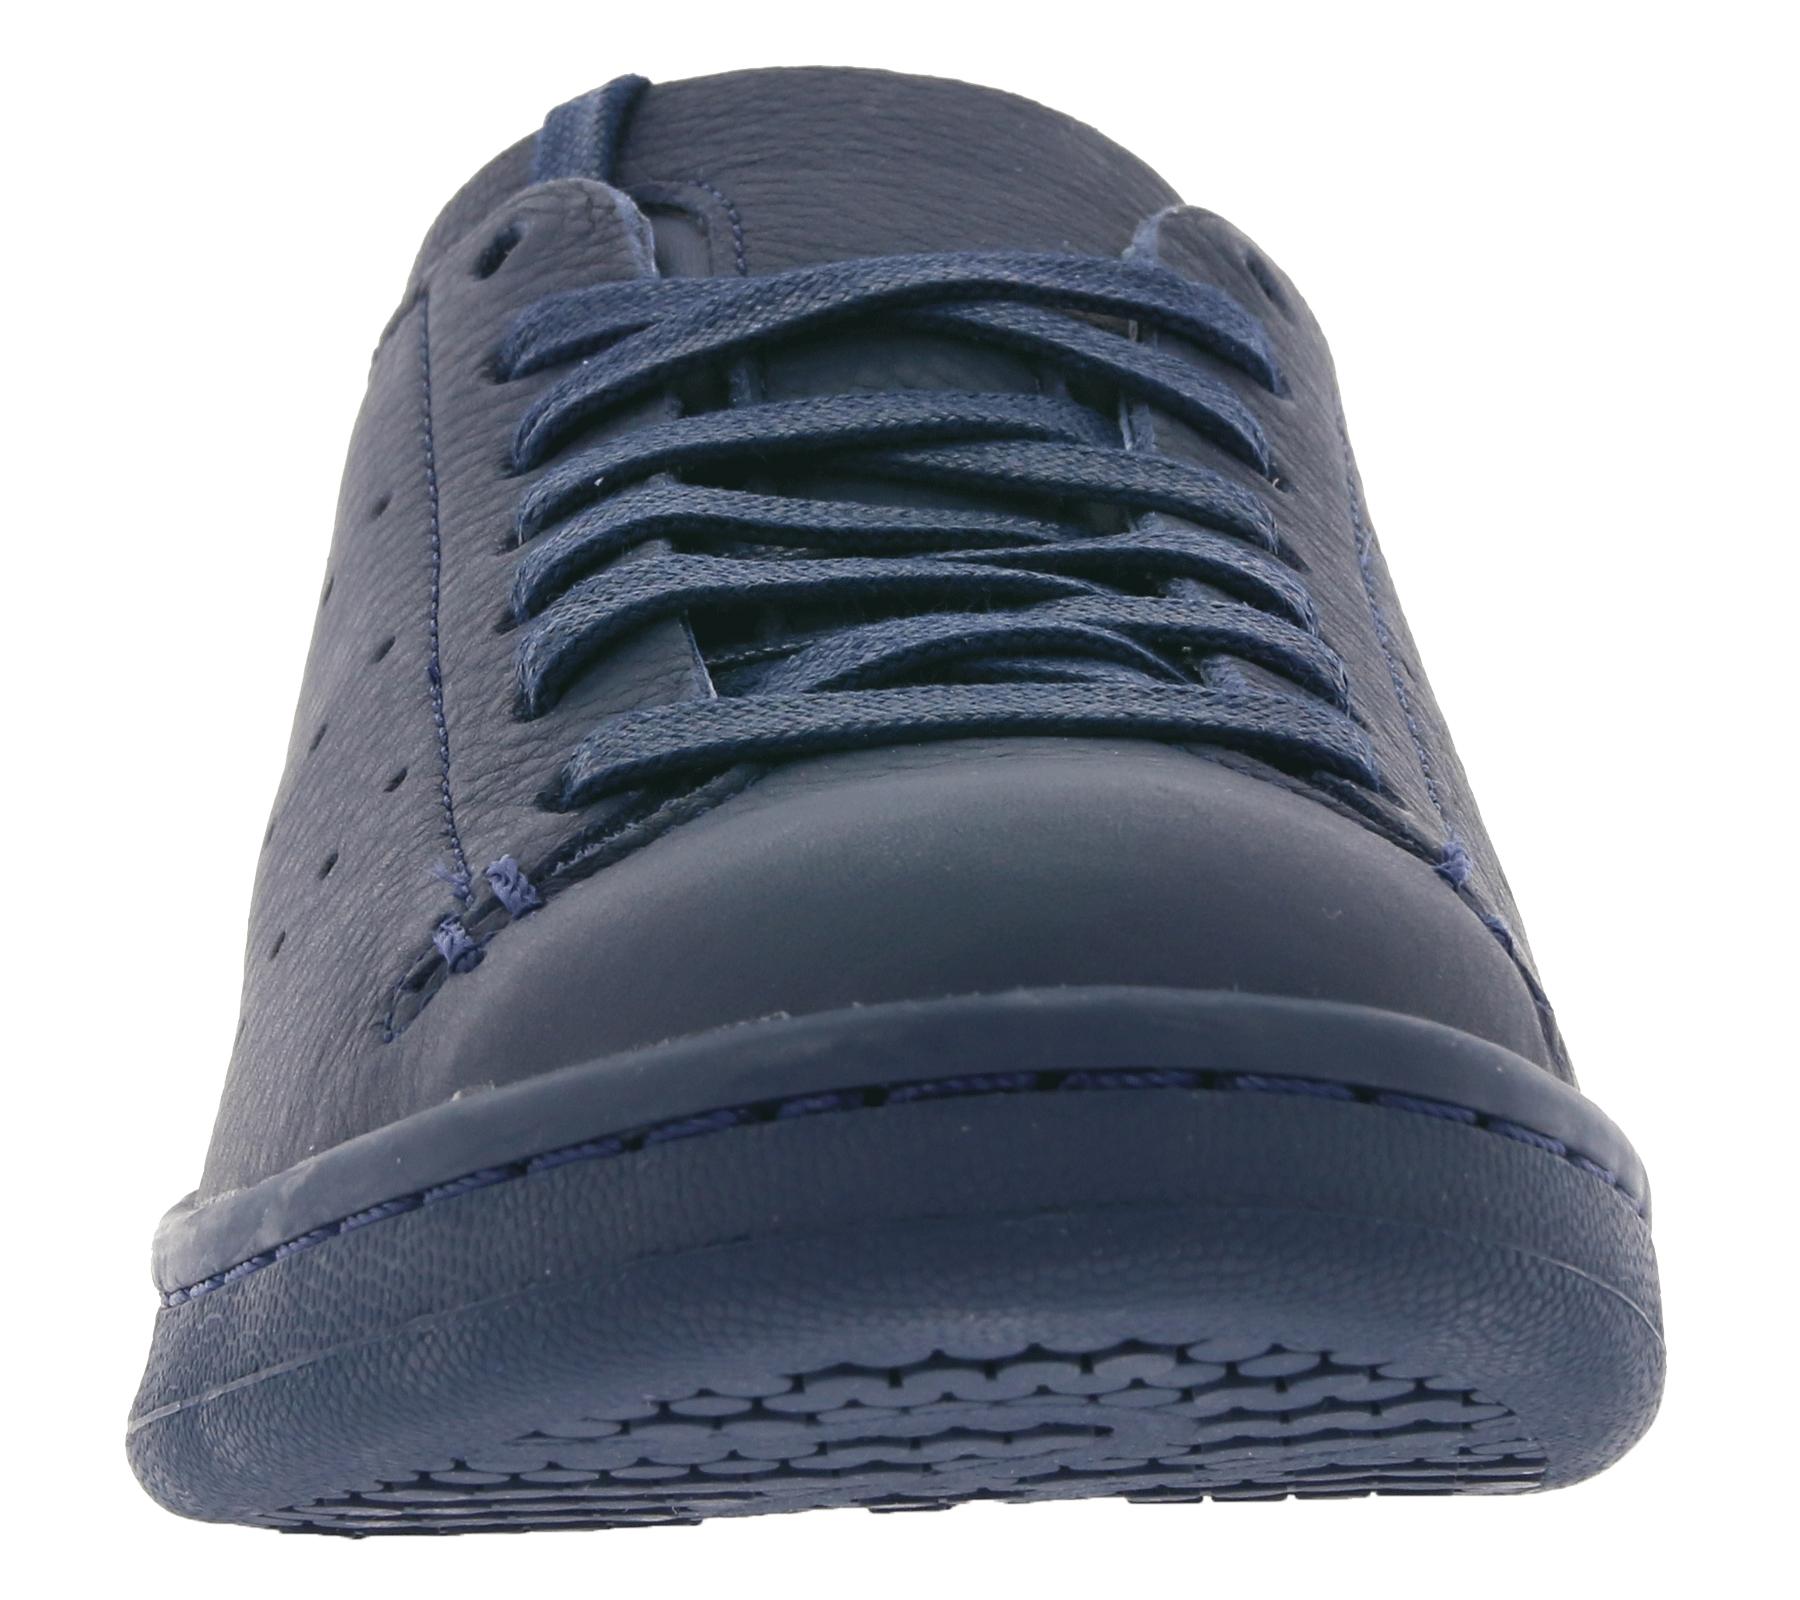 Details zu adidas Damen-Sneaker Originals Stan Smith Lea Sock  Echtleder-Schuhe Blau